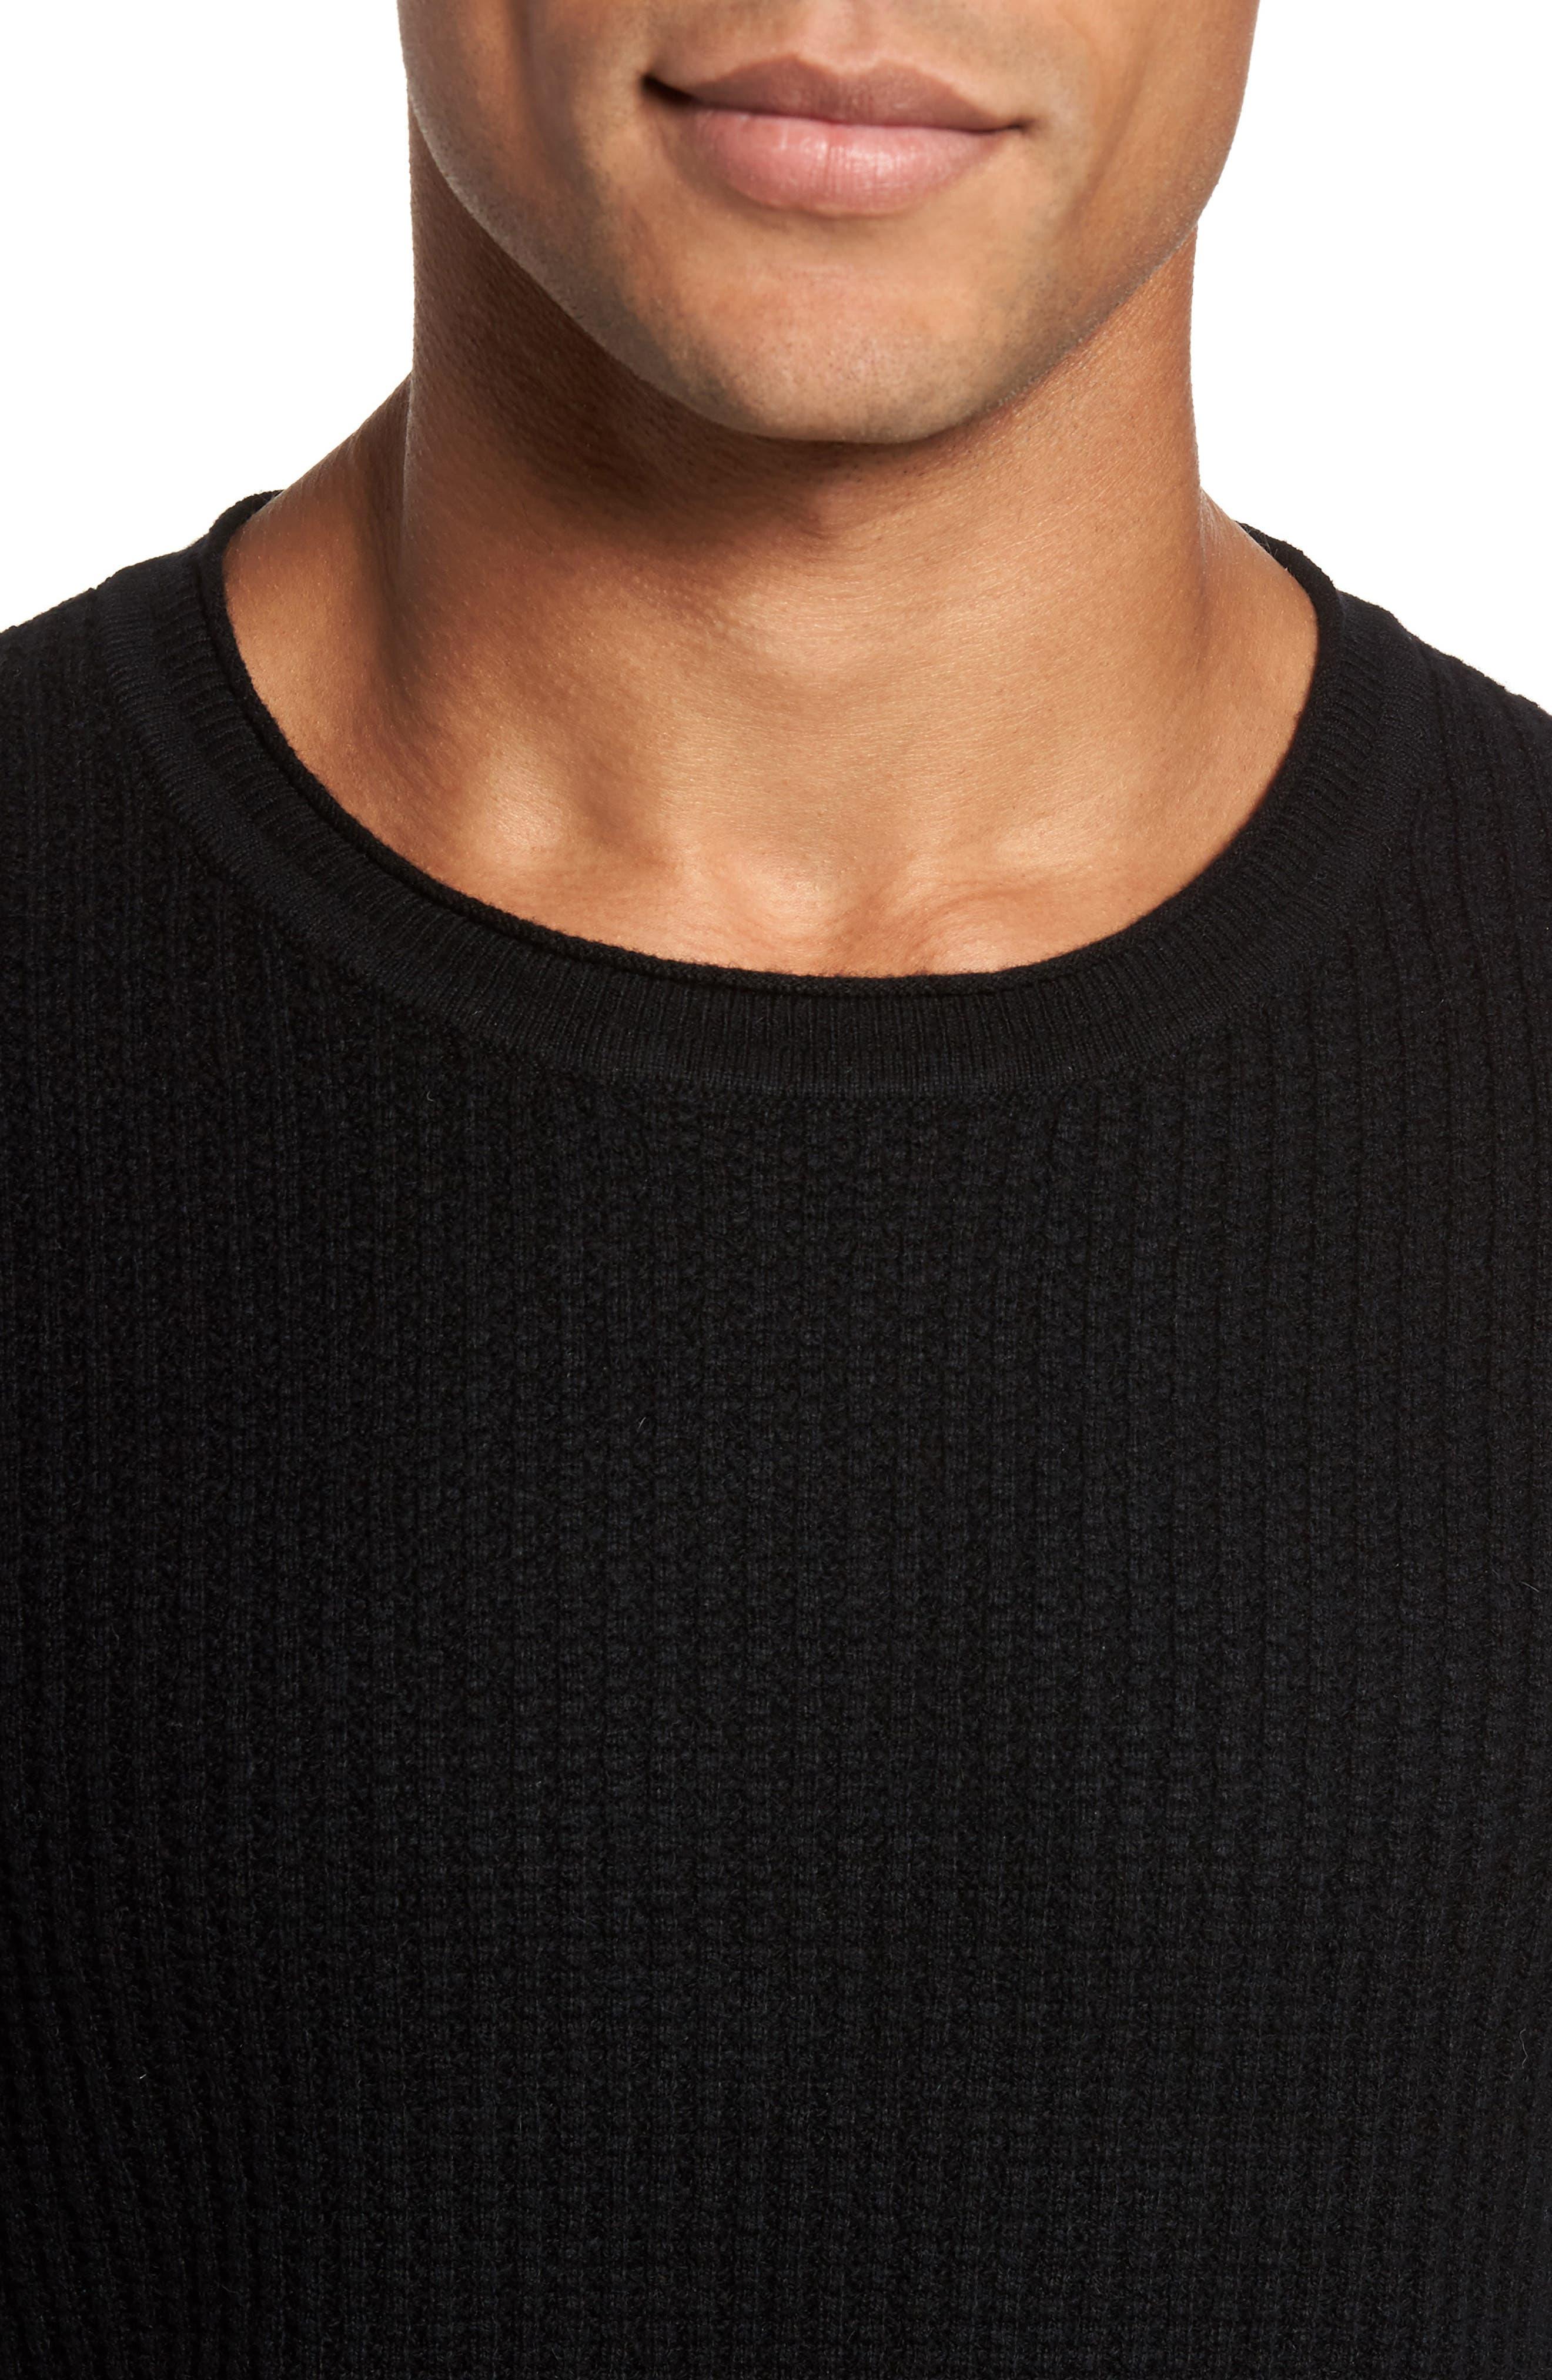 Deklyn Slim Fit Merino & Cashmere Sweatshirt,                             Alternate thumbnail 4, color,                             001